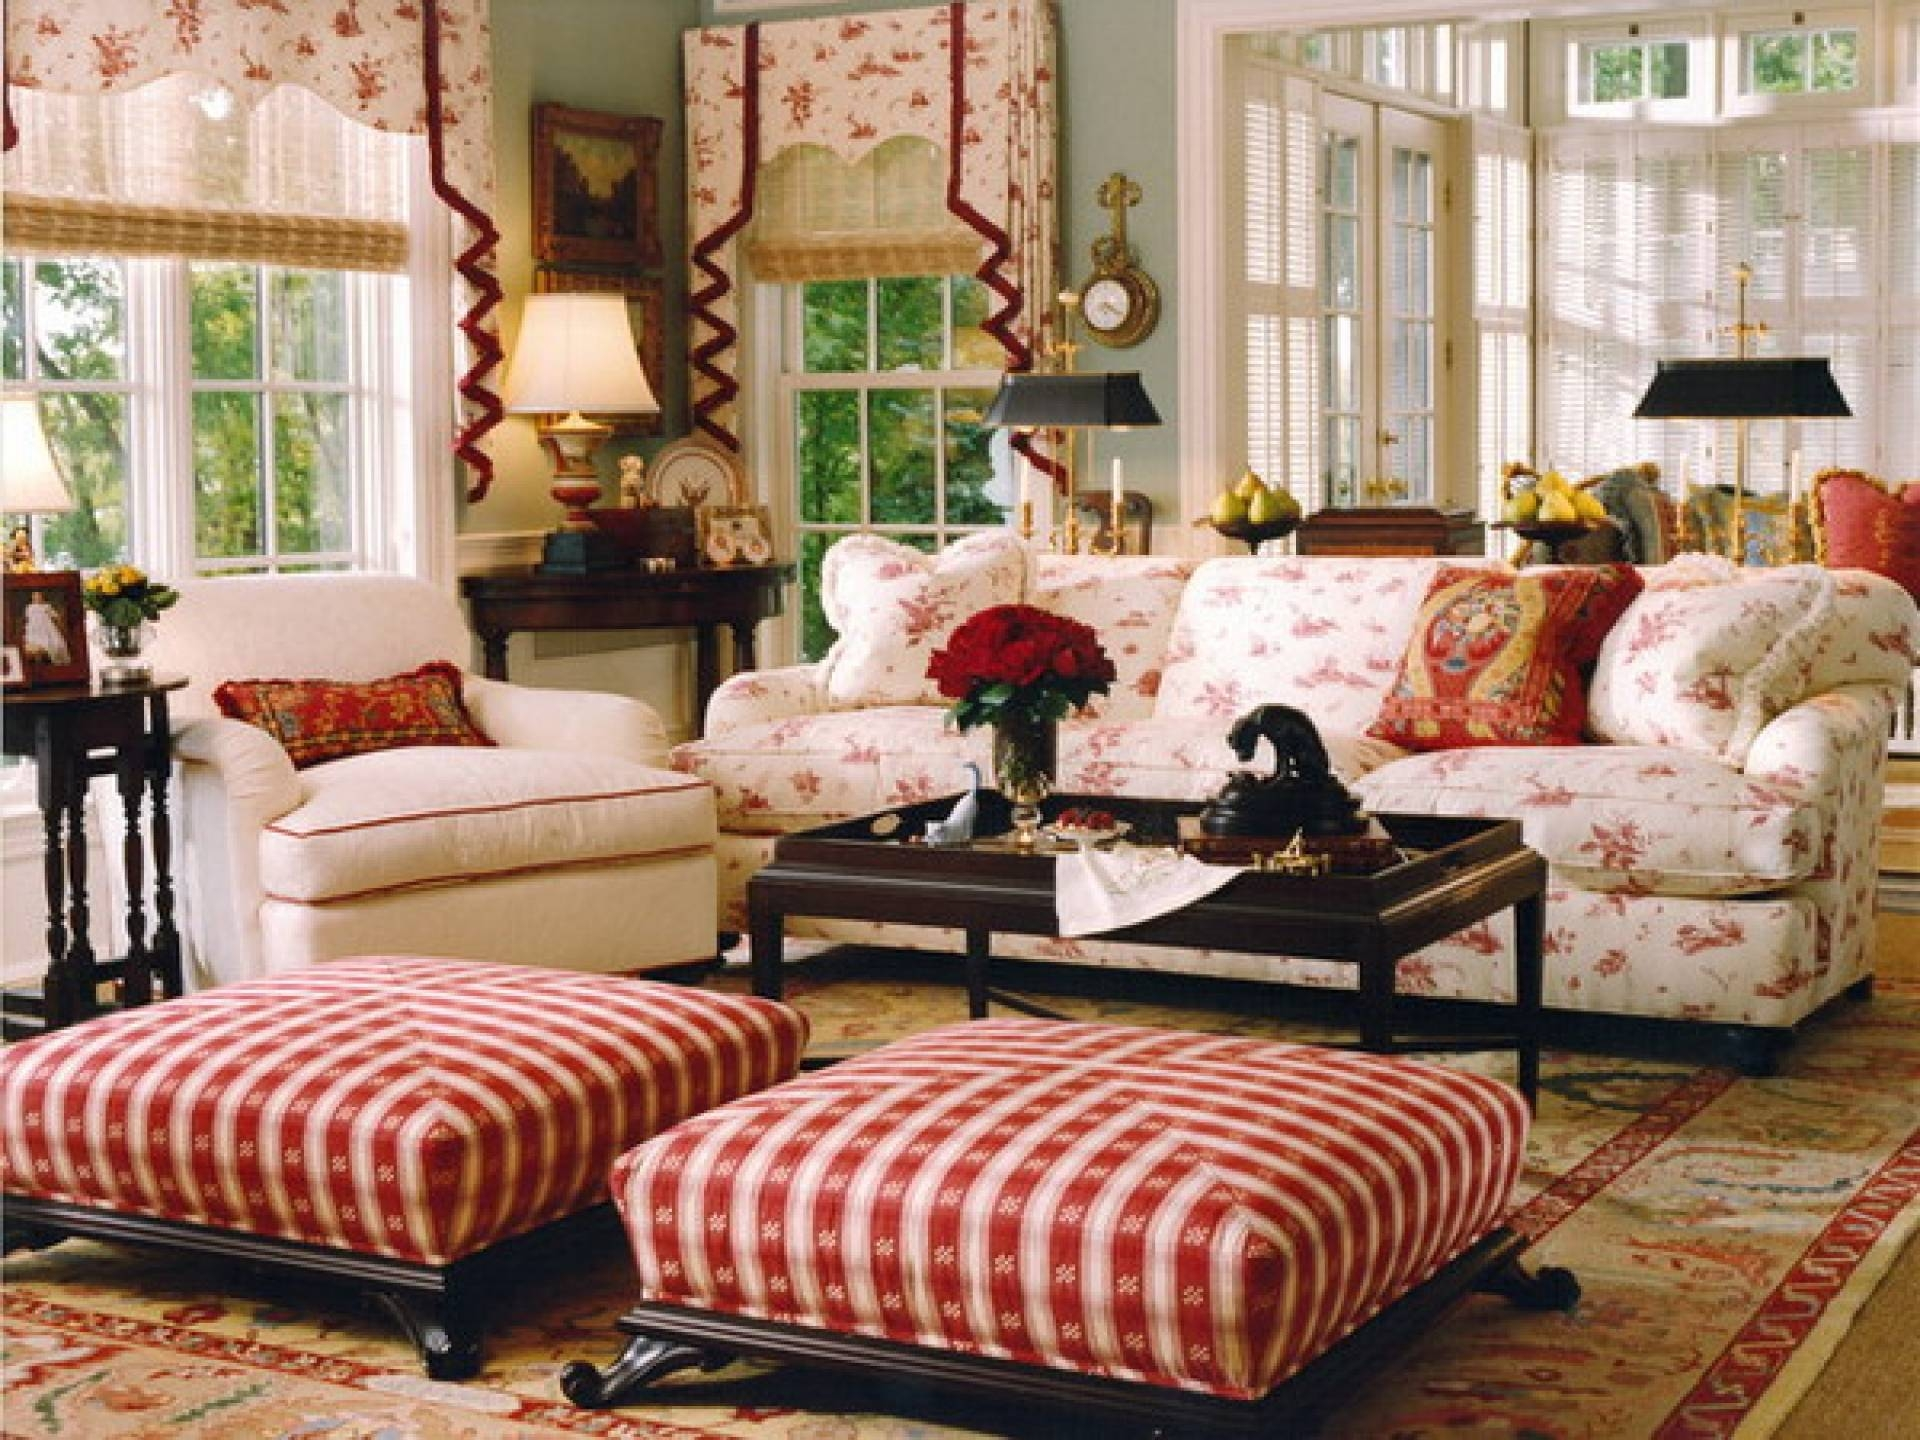 Living Room: Elegant Plaid Living Room Furniture Broyhill Loveseat within Blue Plaid Sofas (Image 6 of 15)